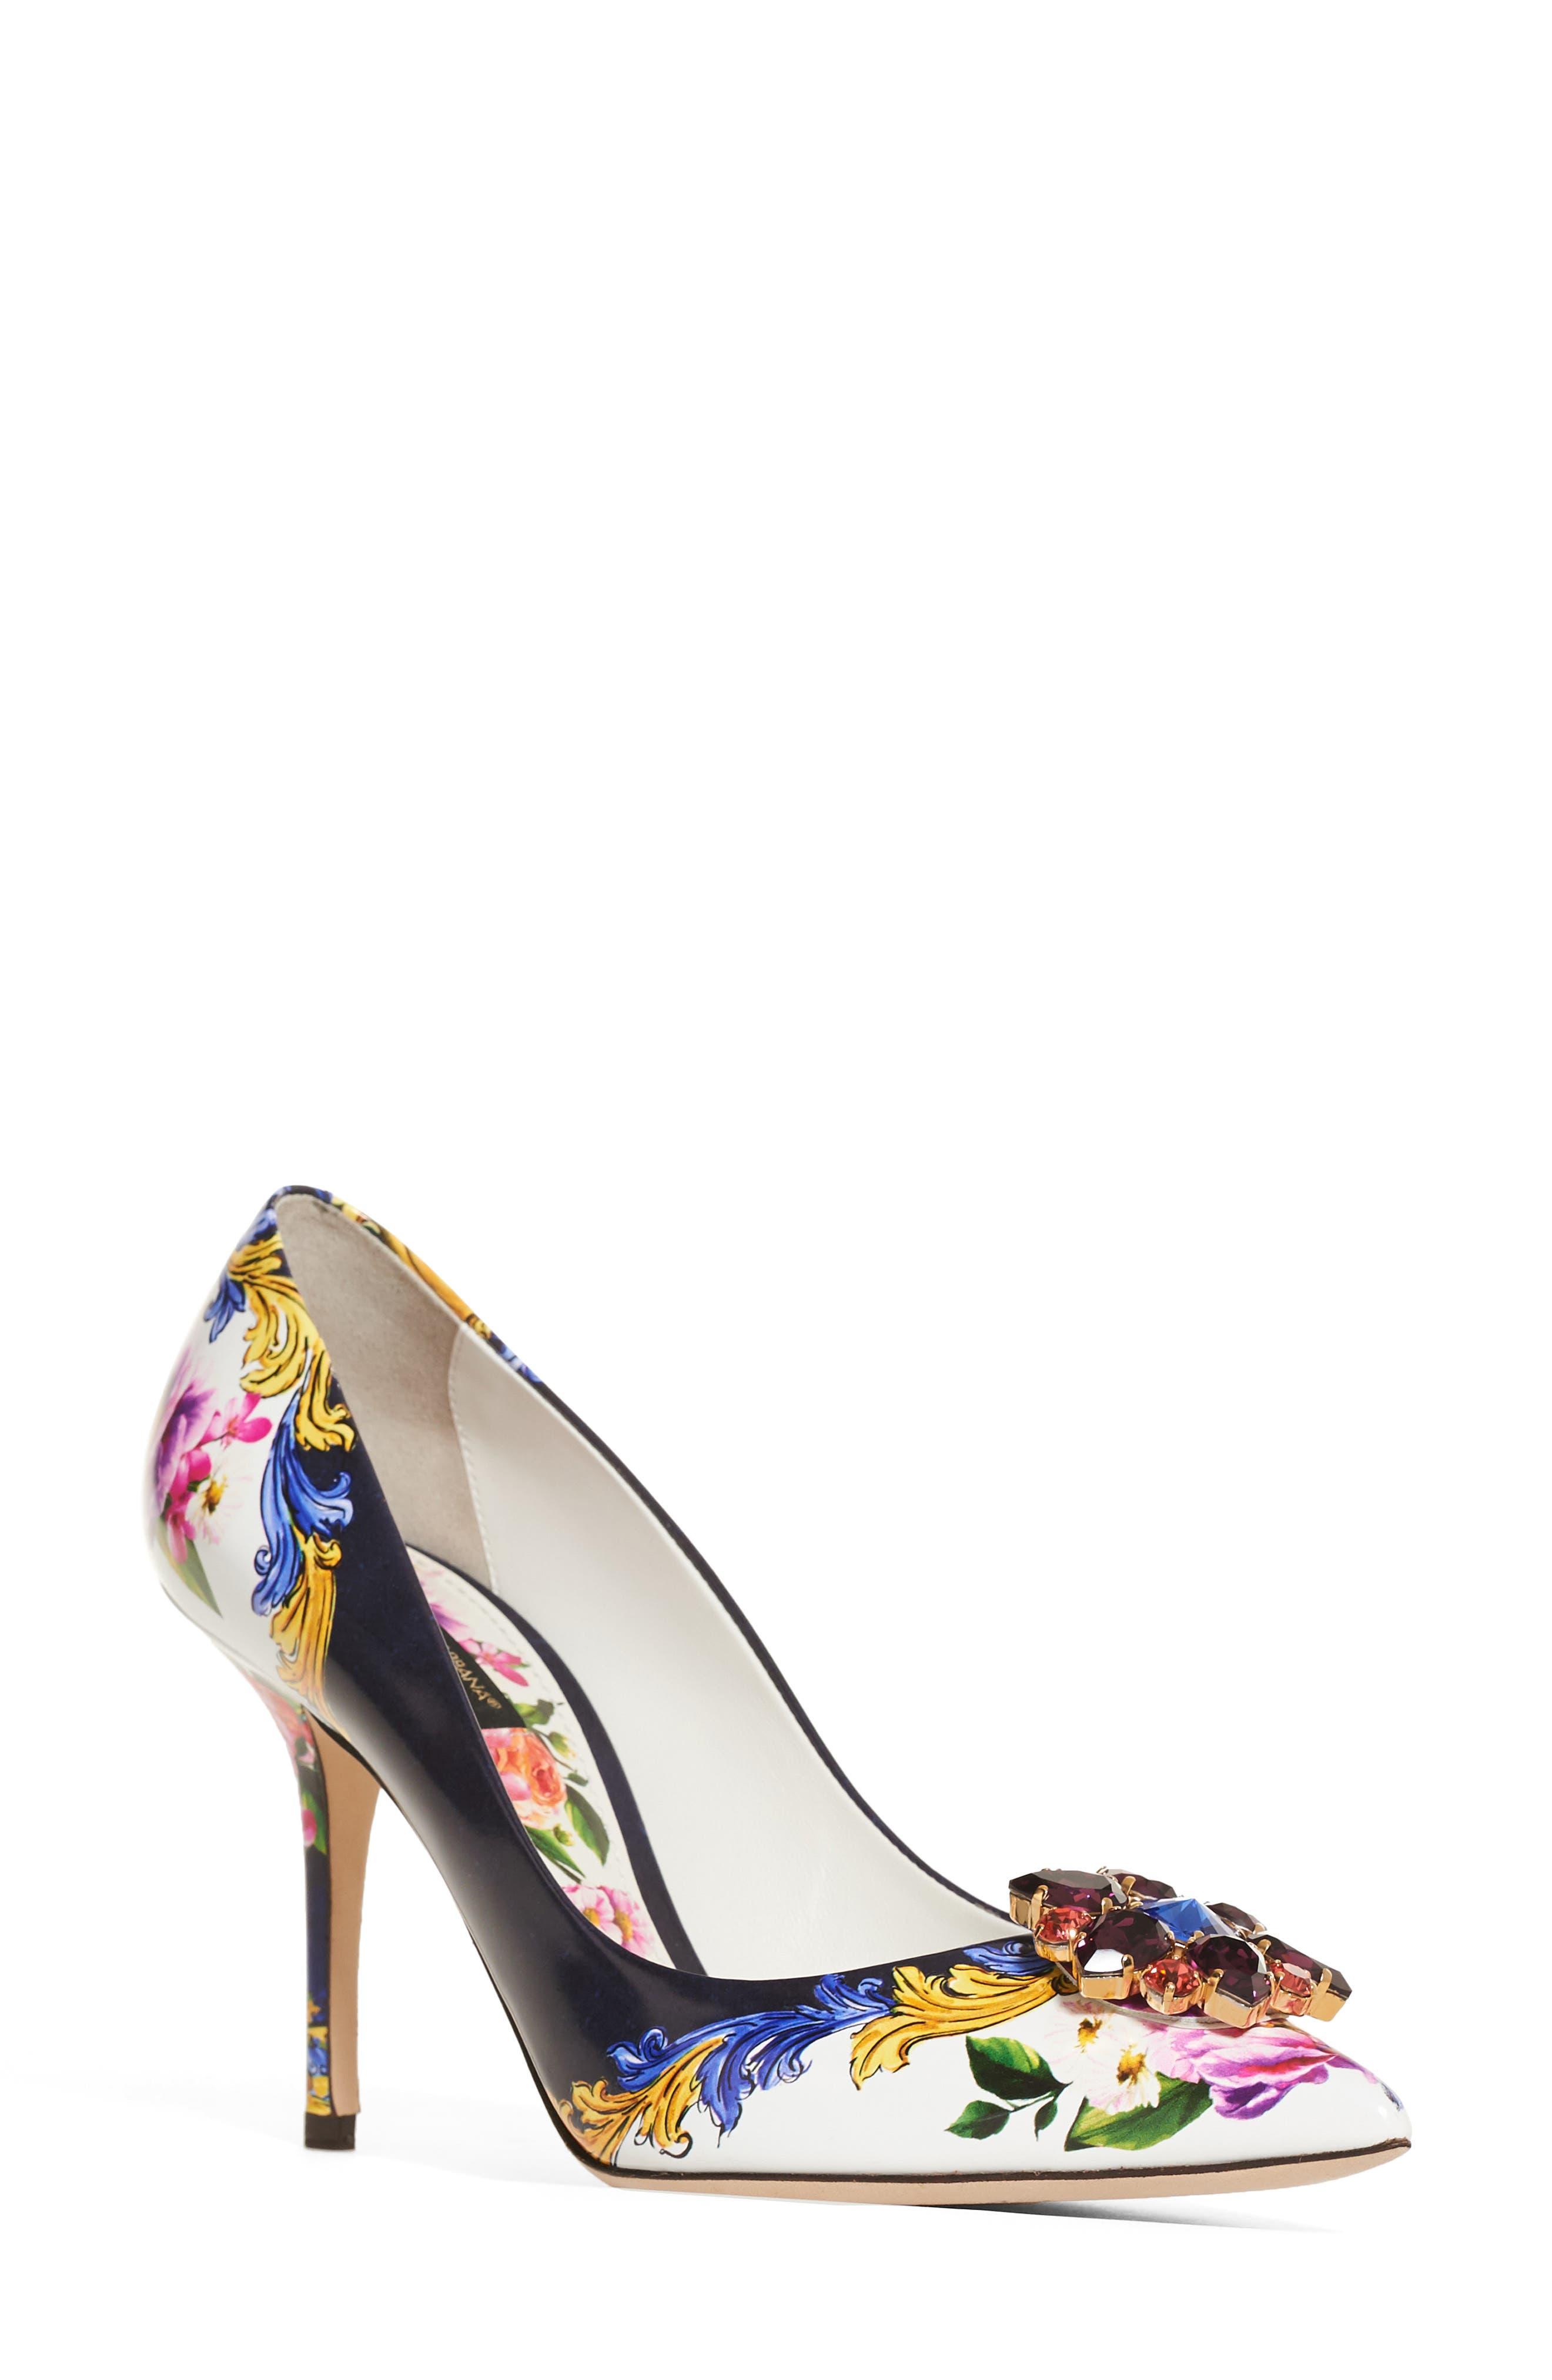 Main Image - Dolce & Gabbana Print Pump (Women)